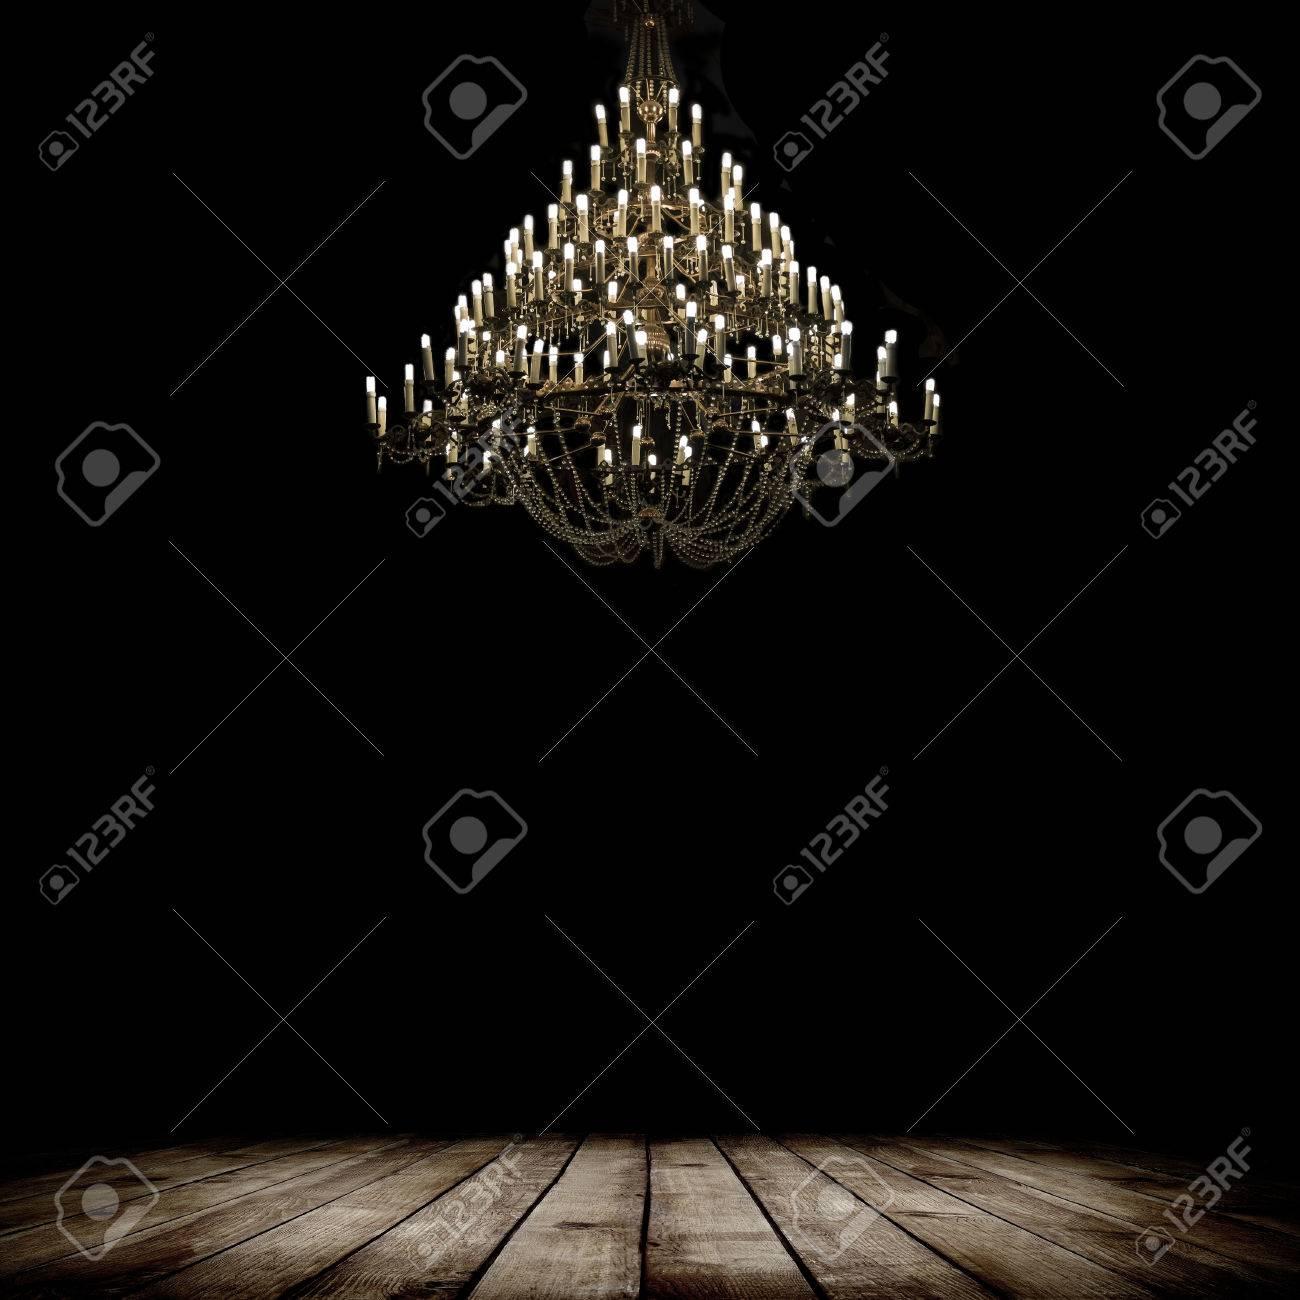 Image Of Grunge Dark Room Interior With Wood Floor And Chandelier 1300x1300